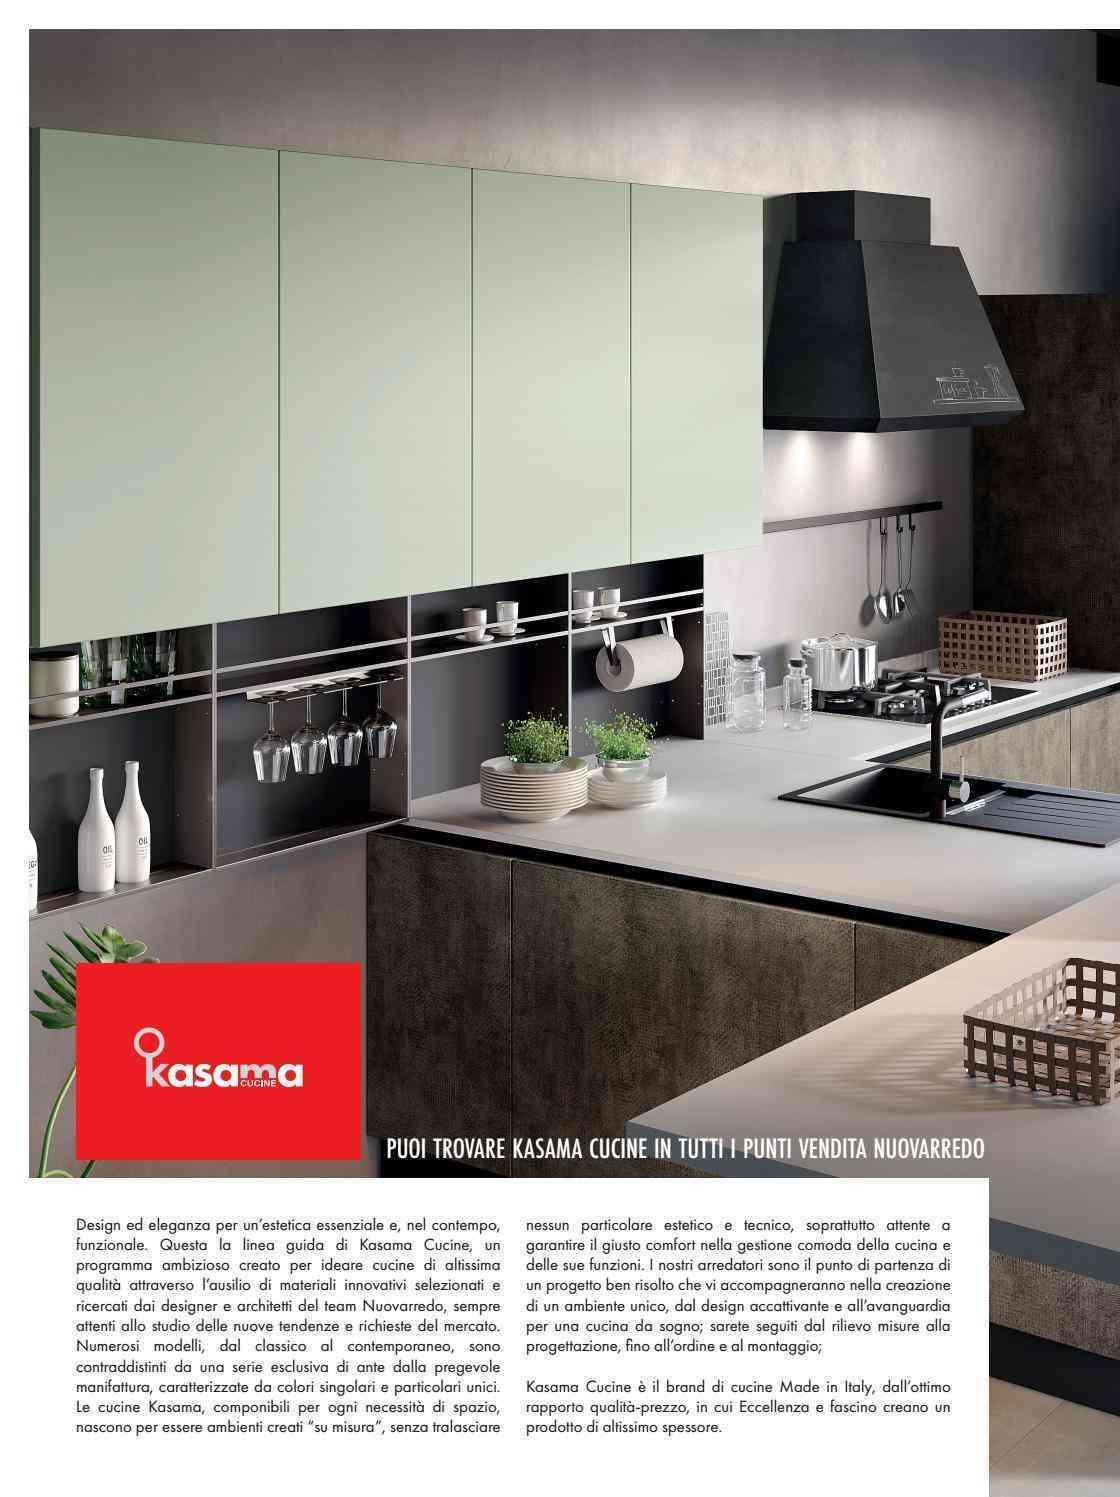 Offerte Cucine Componibili A Francavilla Fontana Negozi Per Arredare Casa Promoqui